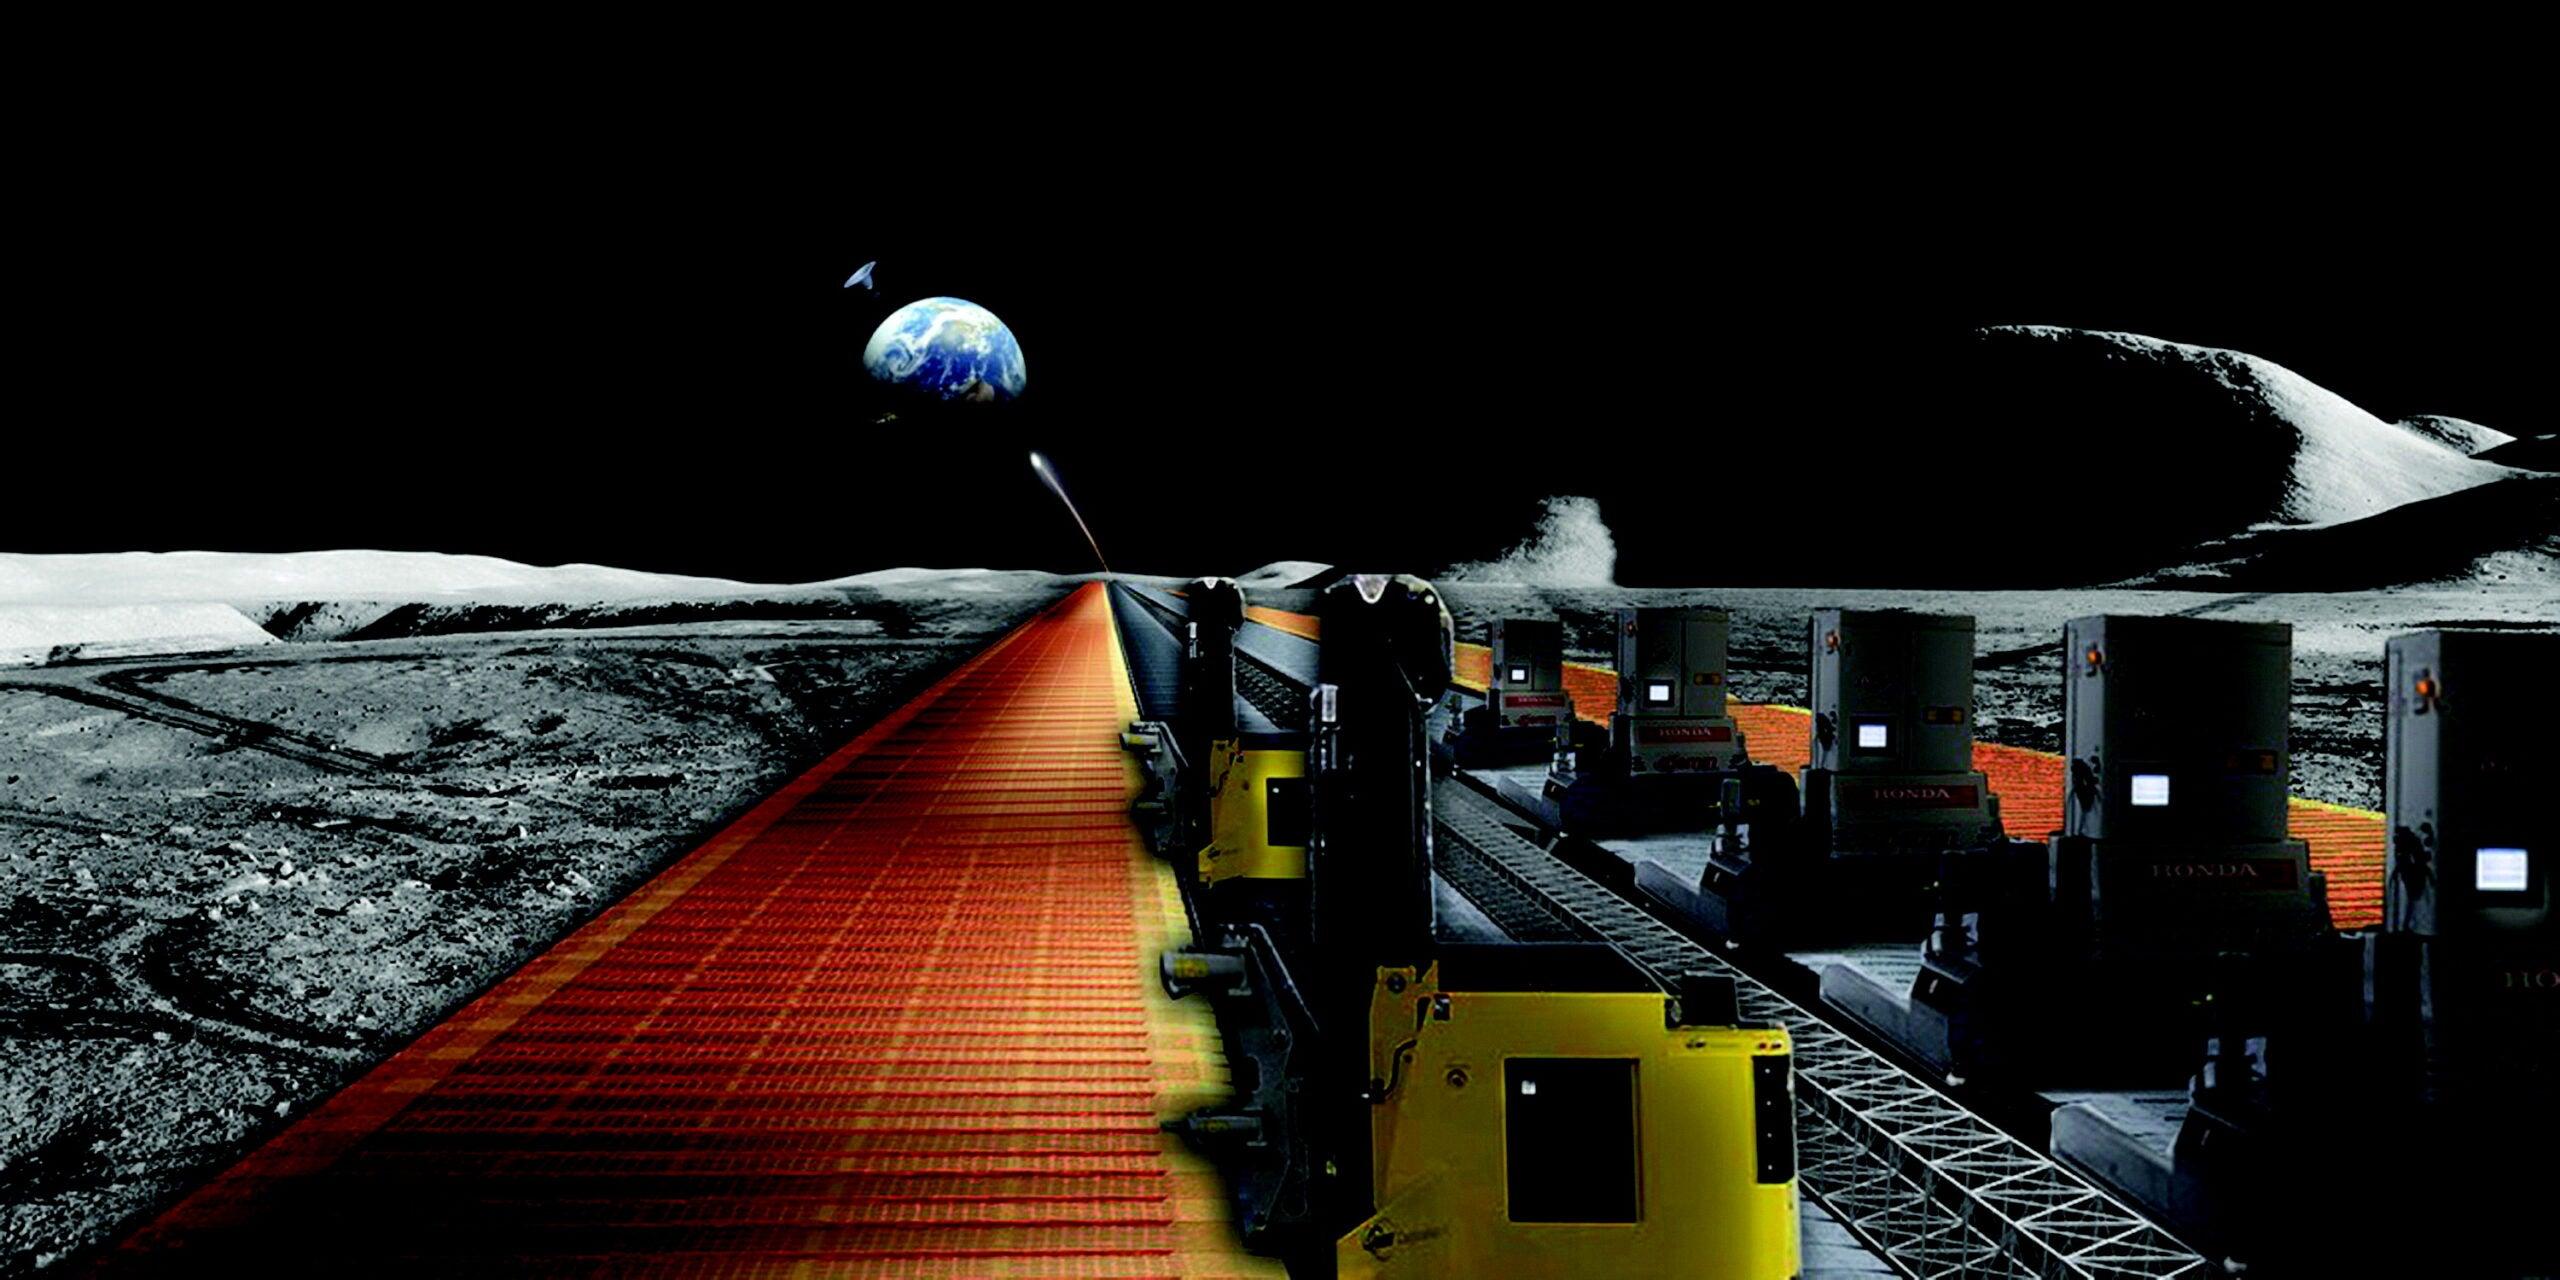 solar panel factory on the moon